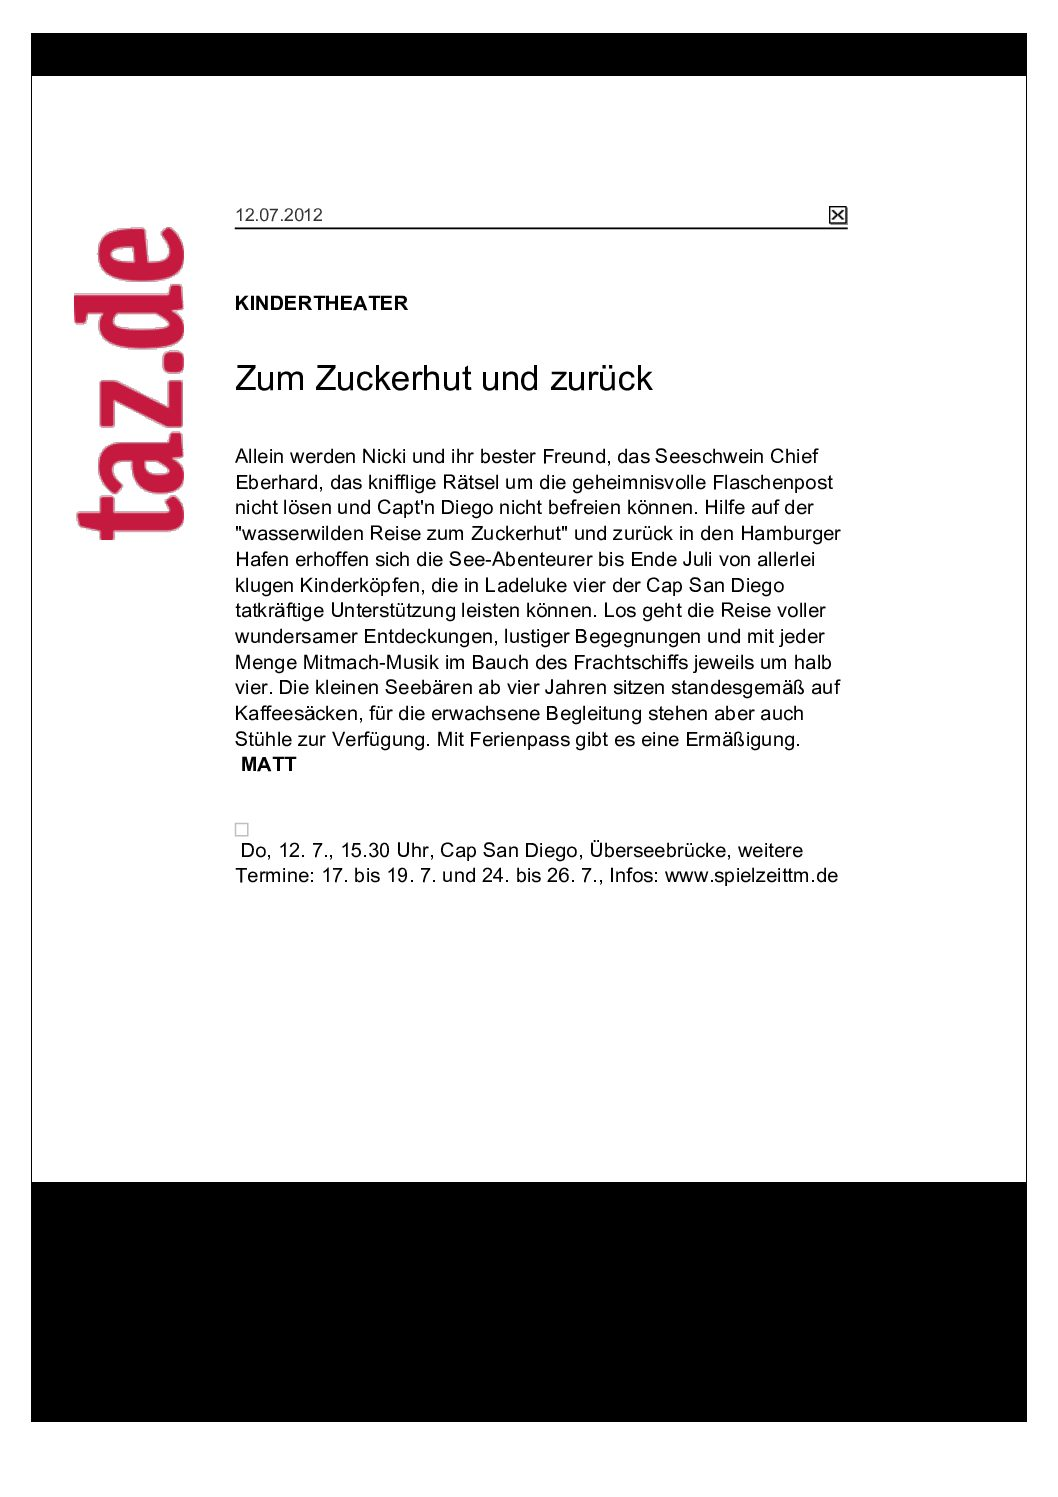 12.07.2012- taz.de